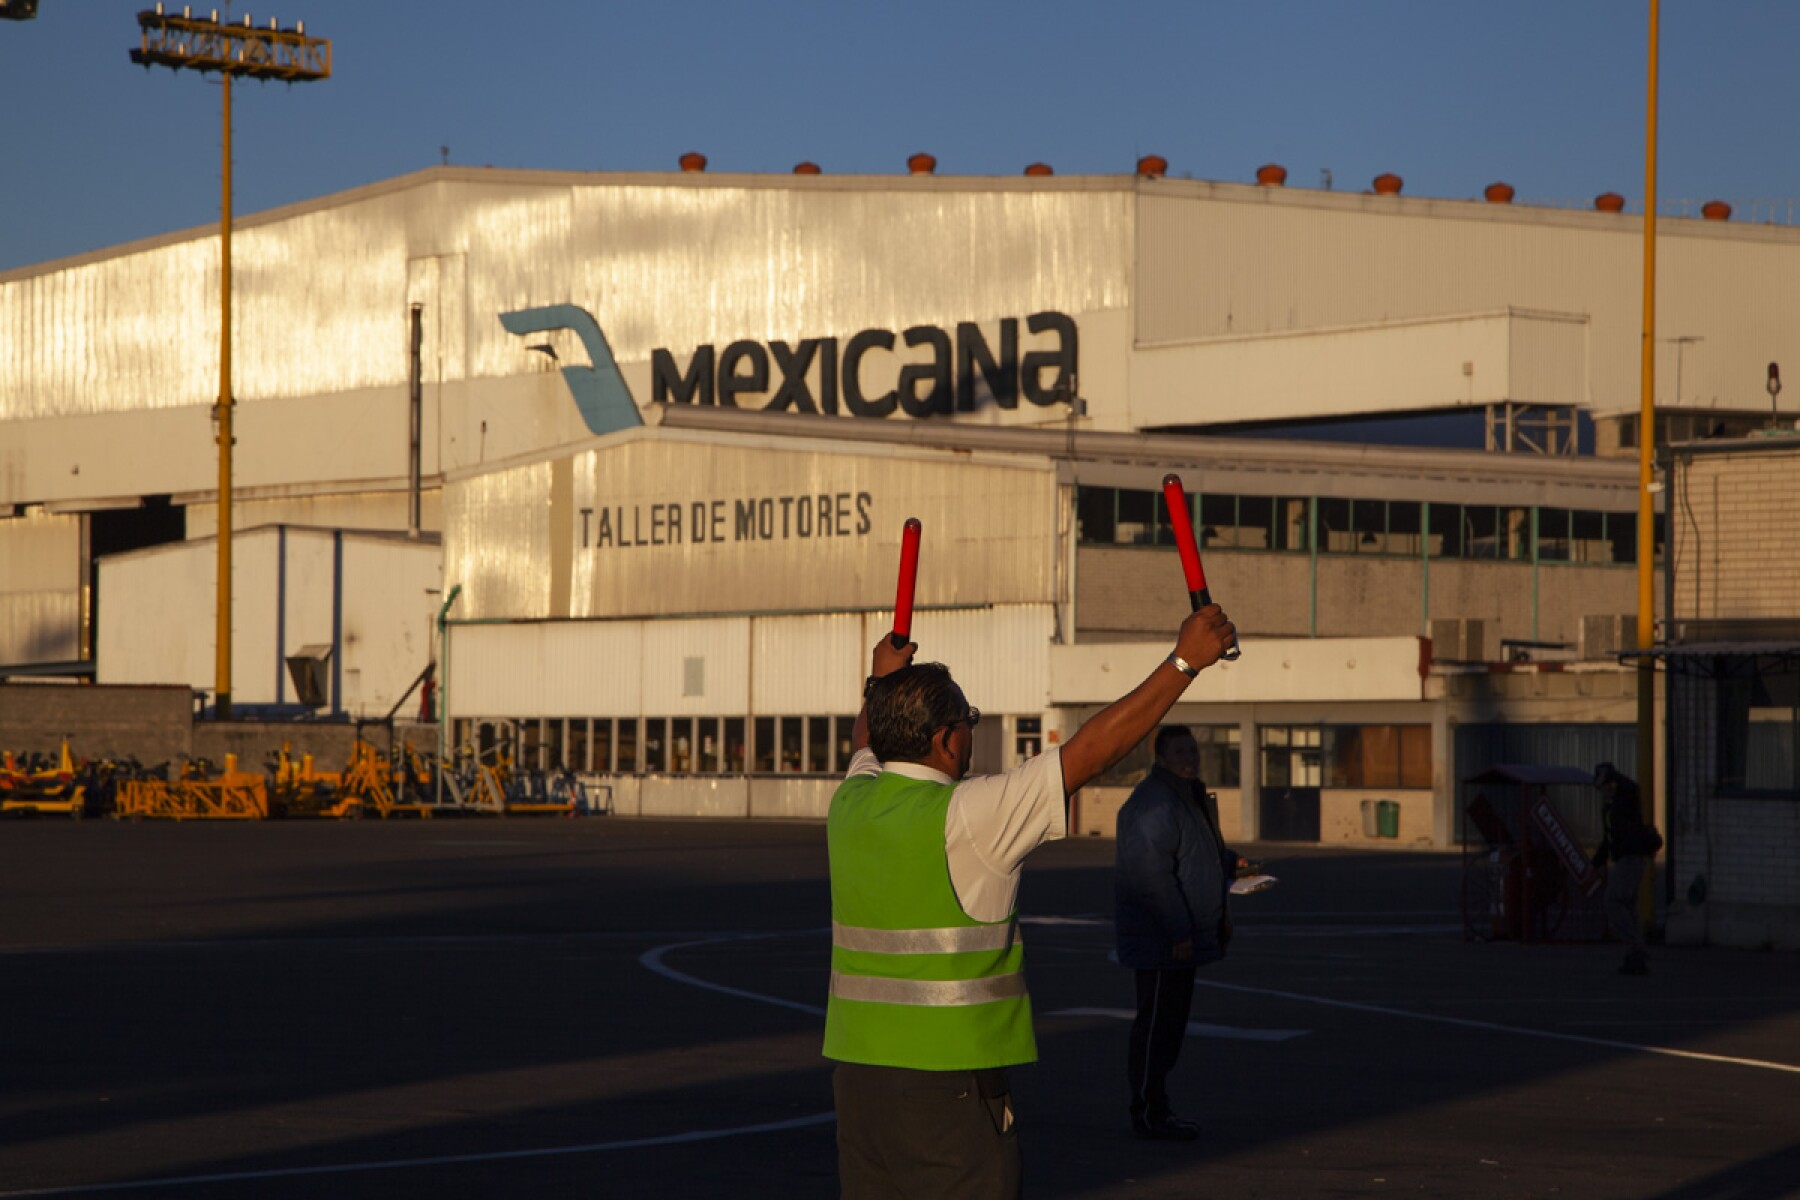 XPA_WEB_AEROPUERTO_MEXICANA_VOLARIS_ARCHIVO_045.jpg